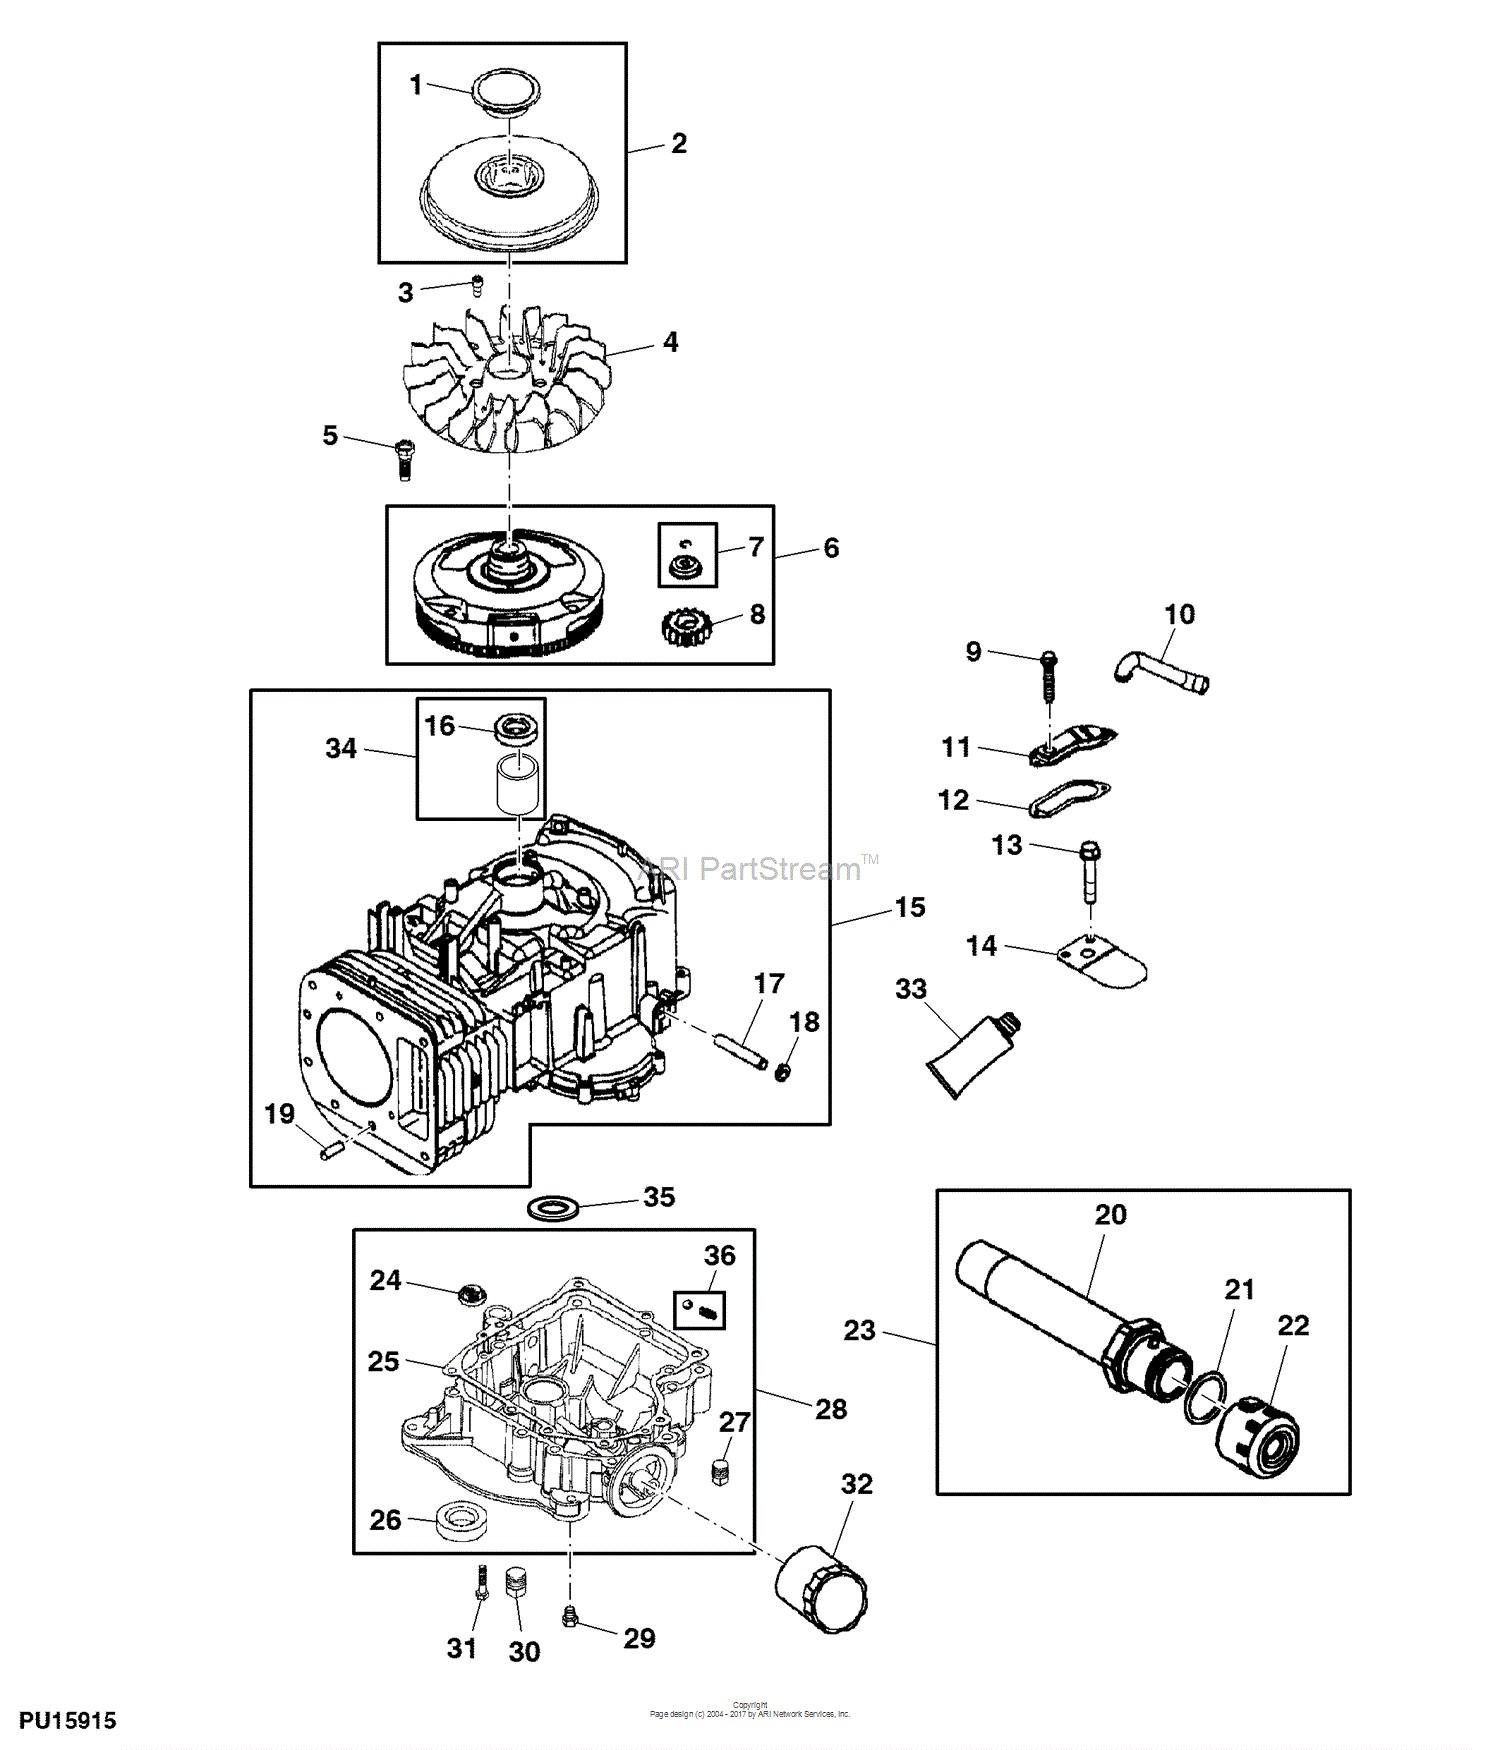 John deere la105 engine diagram john deere parts diagrams john deere la105 tractor pc9740 of john